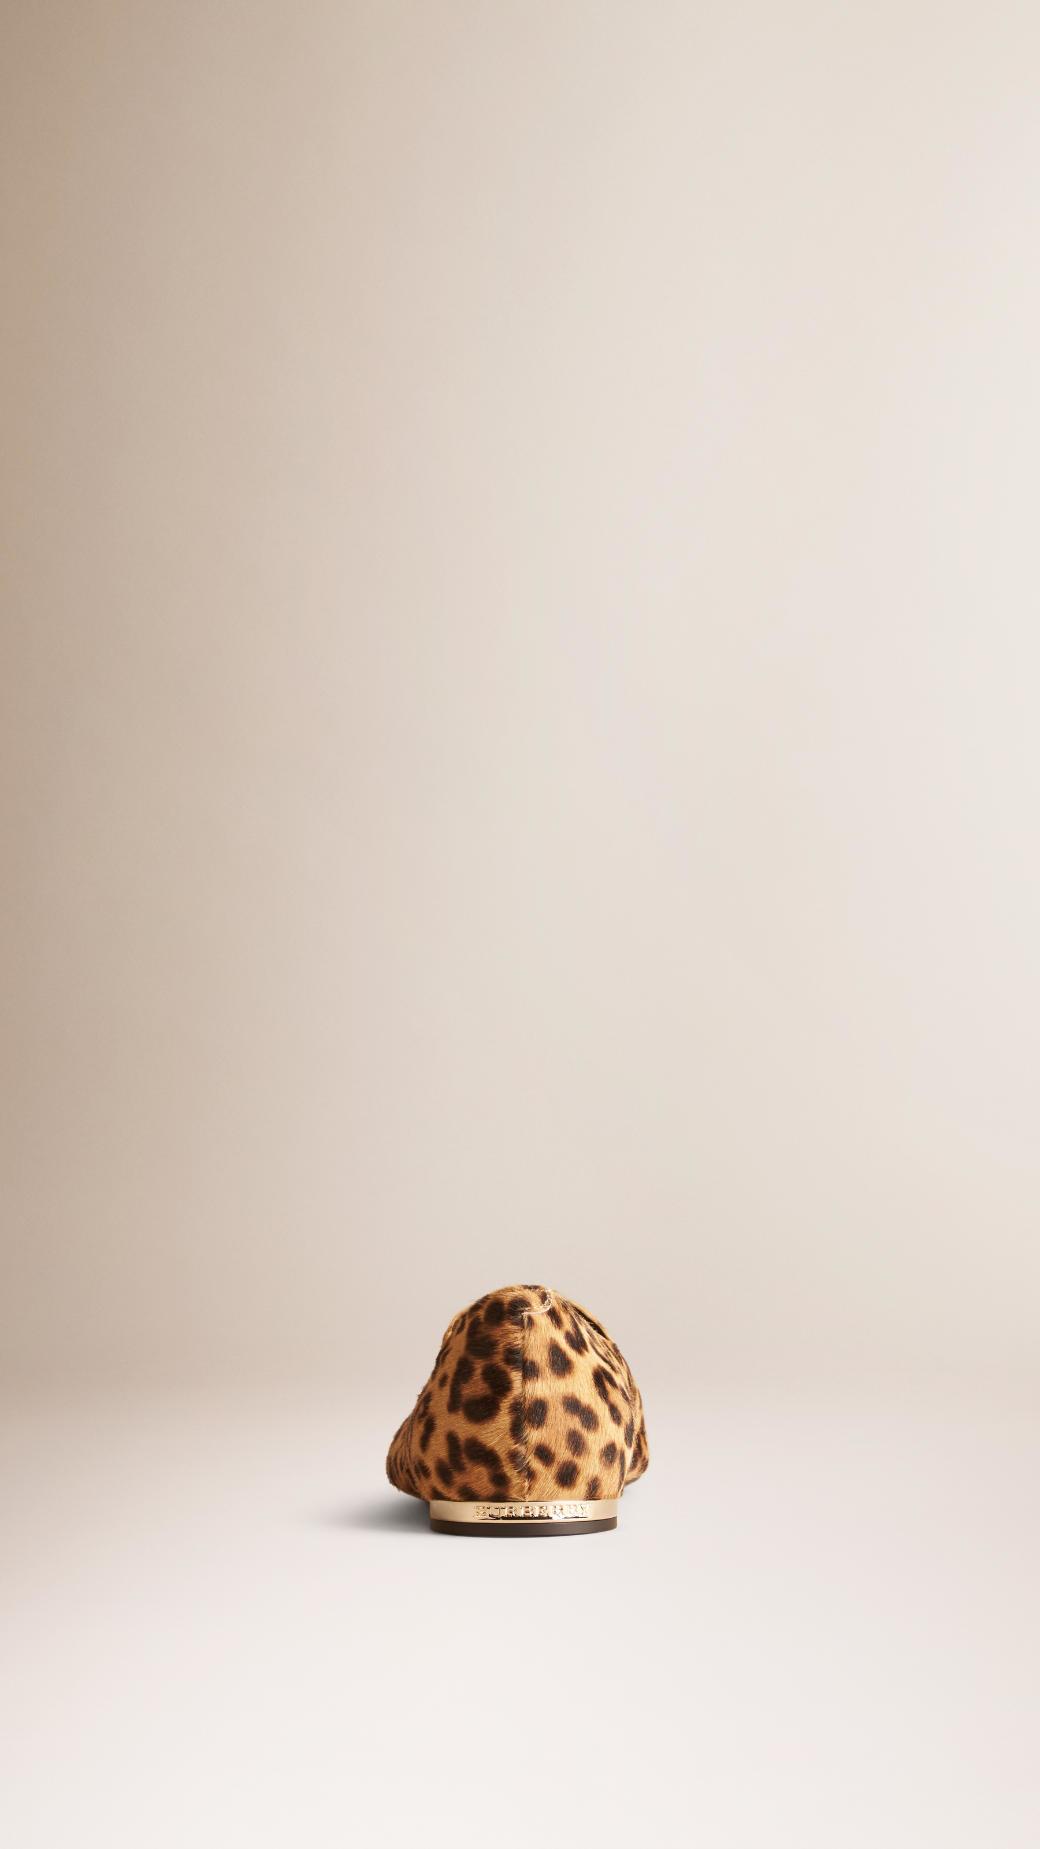 ac4c5fcd94f Lyst - Burberry Leopard-Print Calfskin Loafers